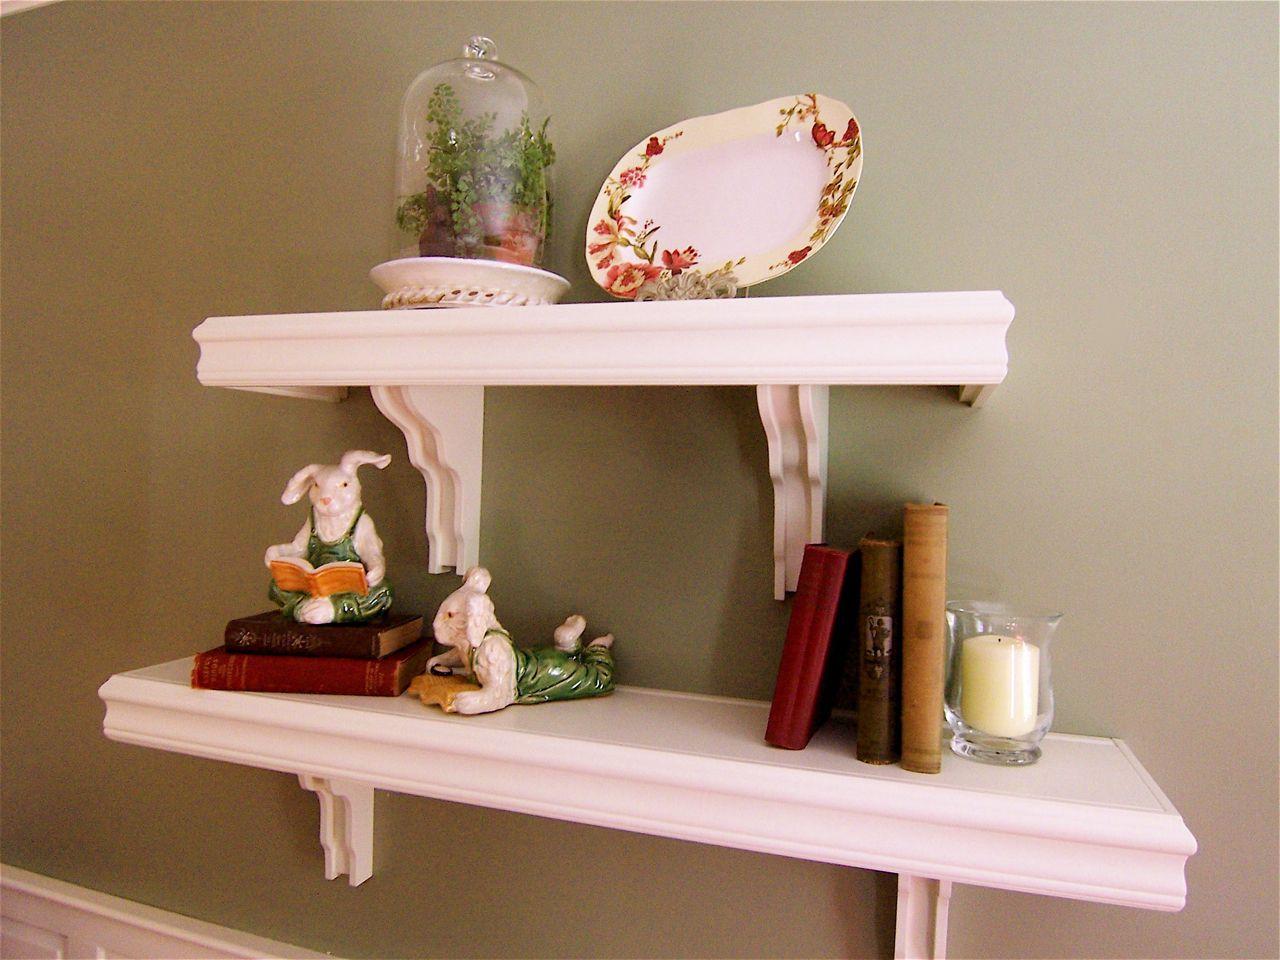 The Ballard Designs Cafe Shelves In A Clients Home With Images Ballard Designs House Design Design